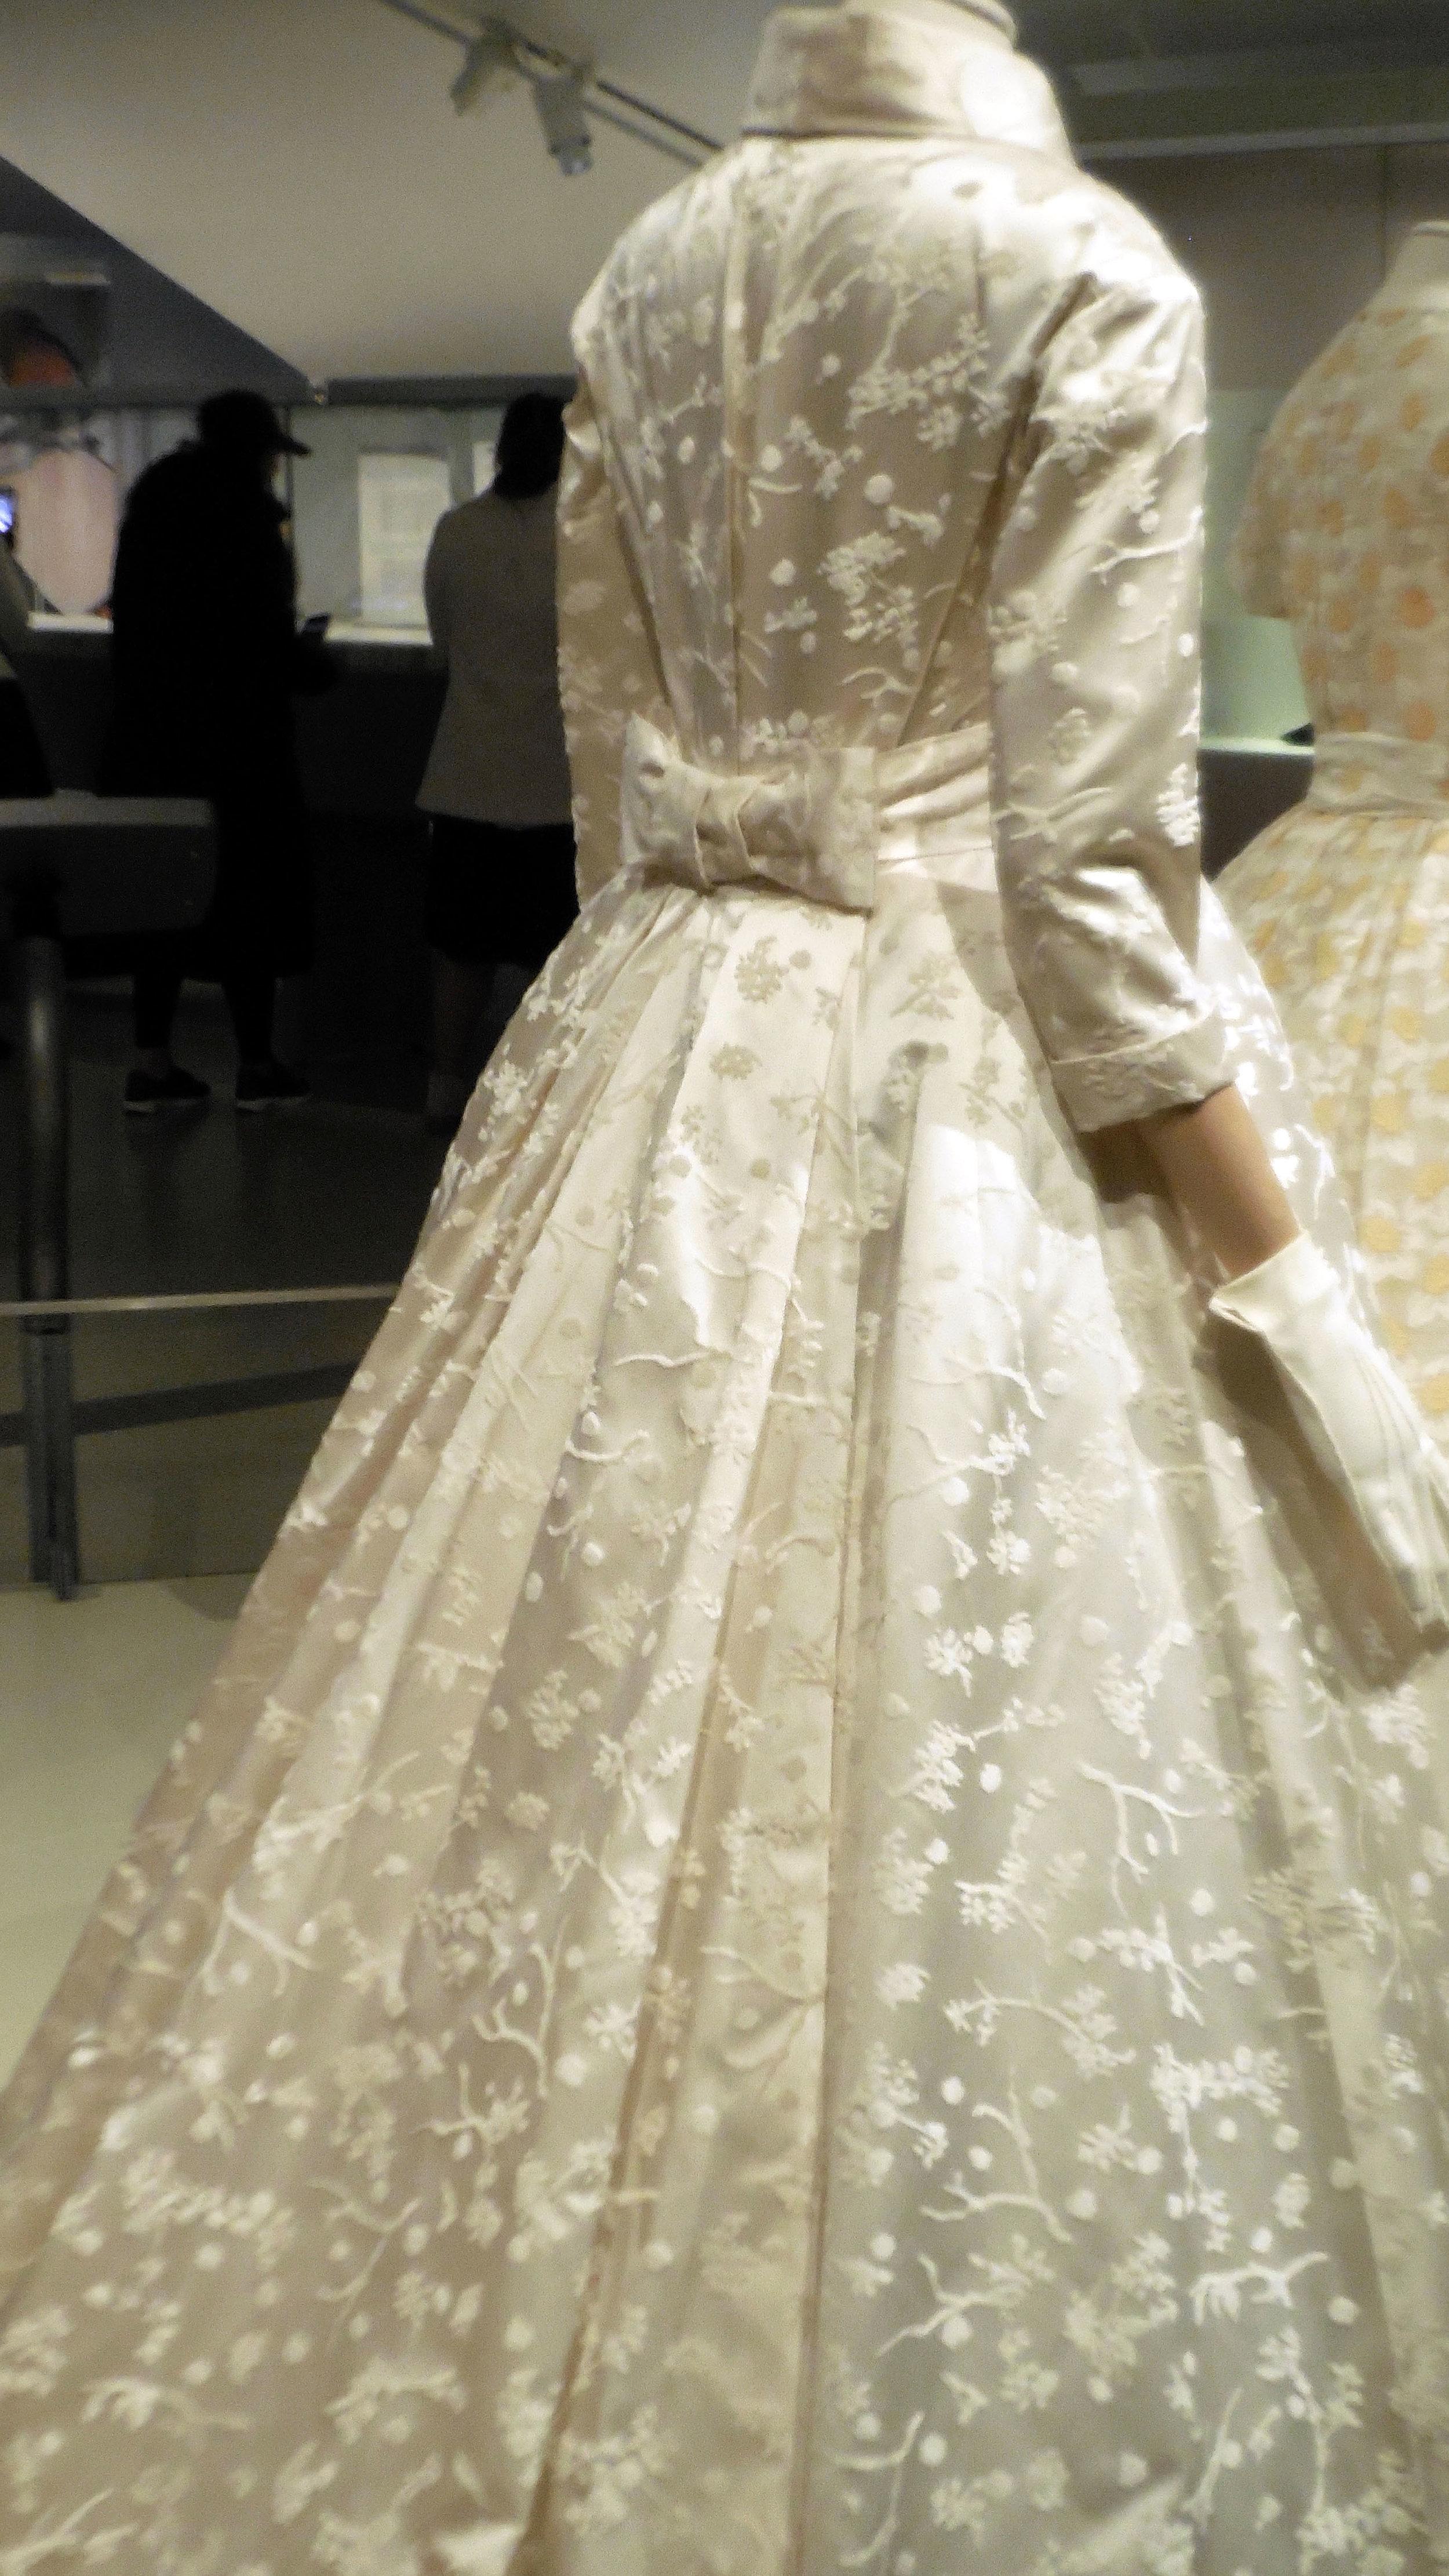 Dior White Gown.jpg